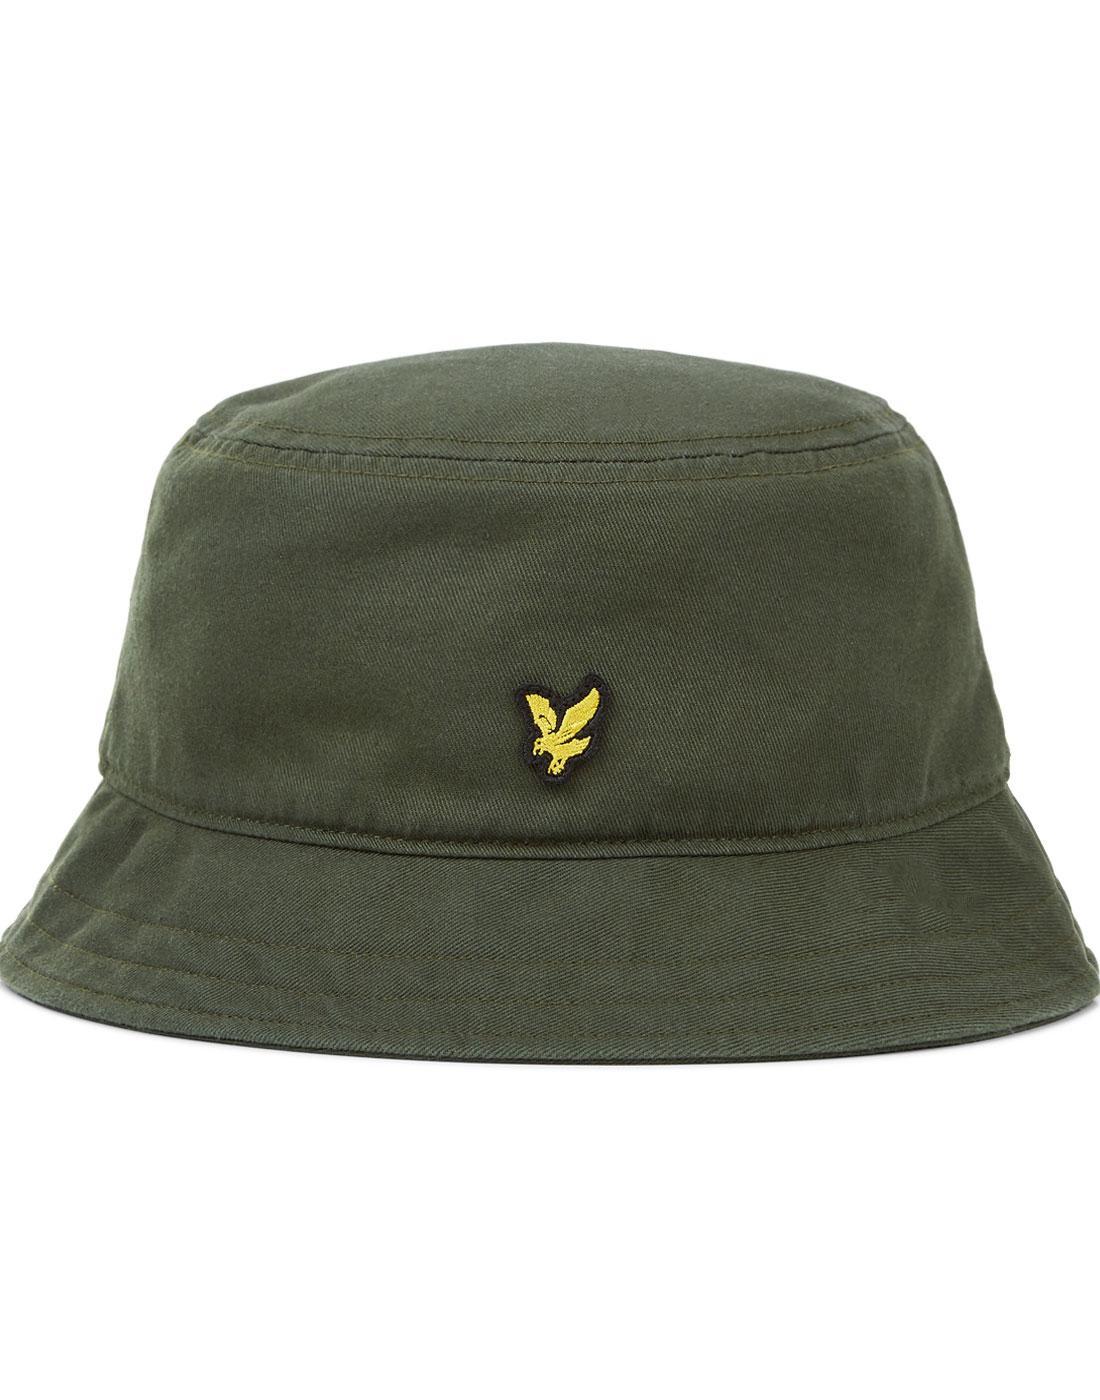 94b69f8a81ed8a LYLE & SCOTT Retro 90s Britpop Twill Bucket Hat Leaf Green